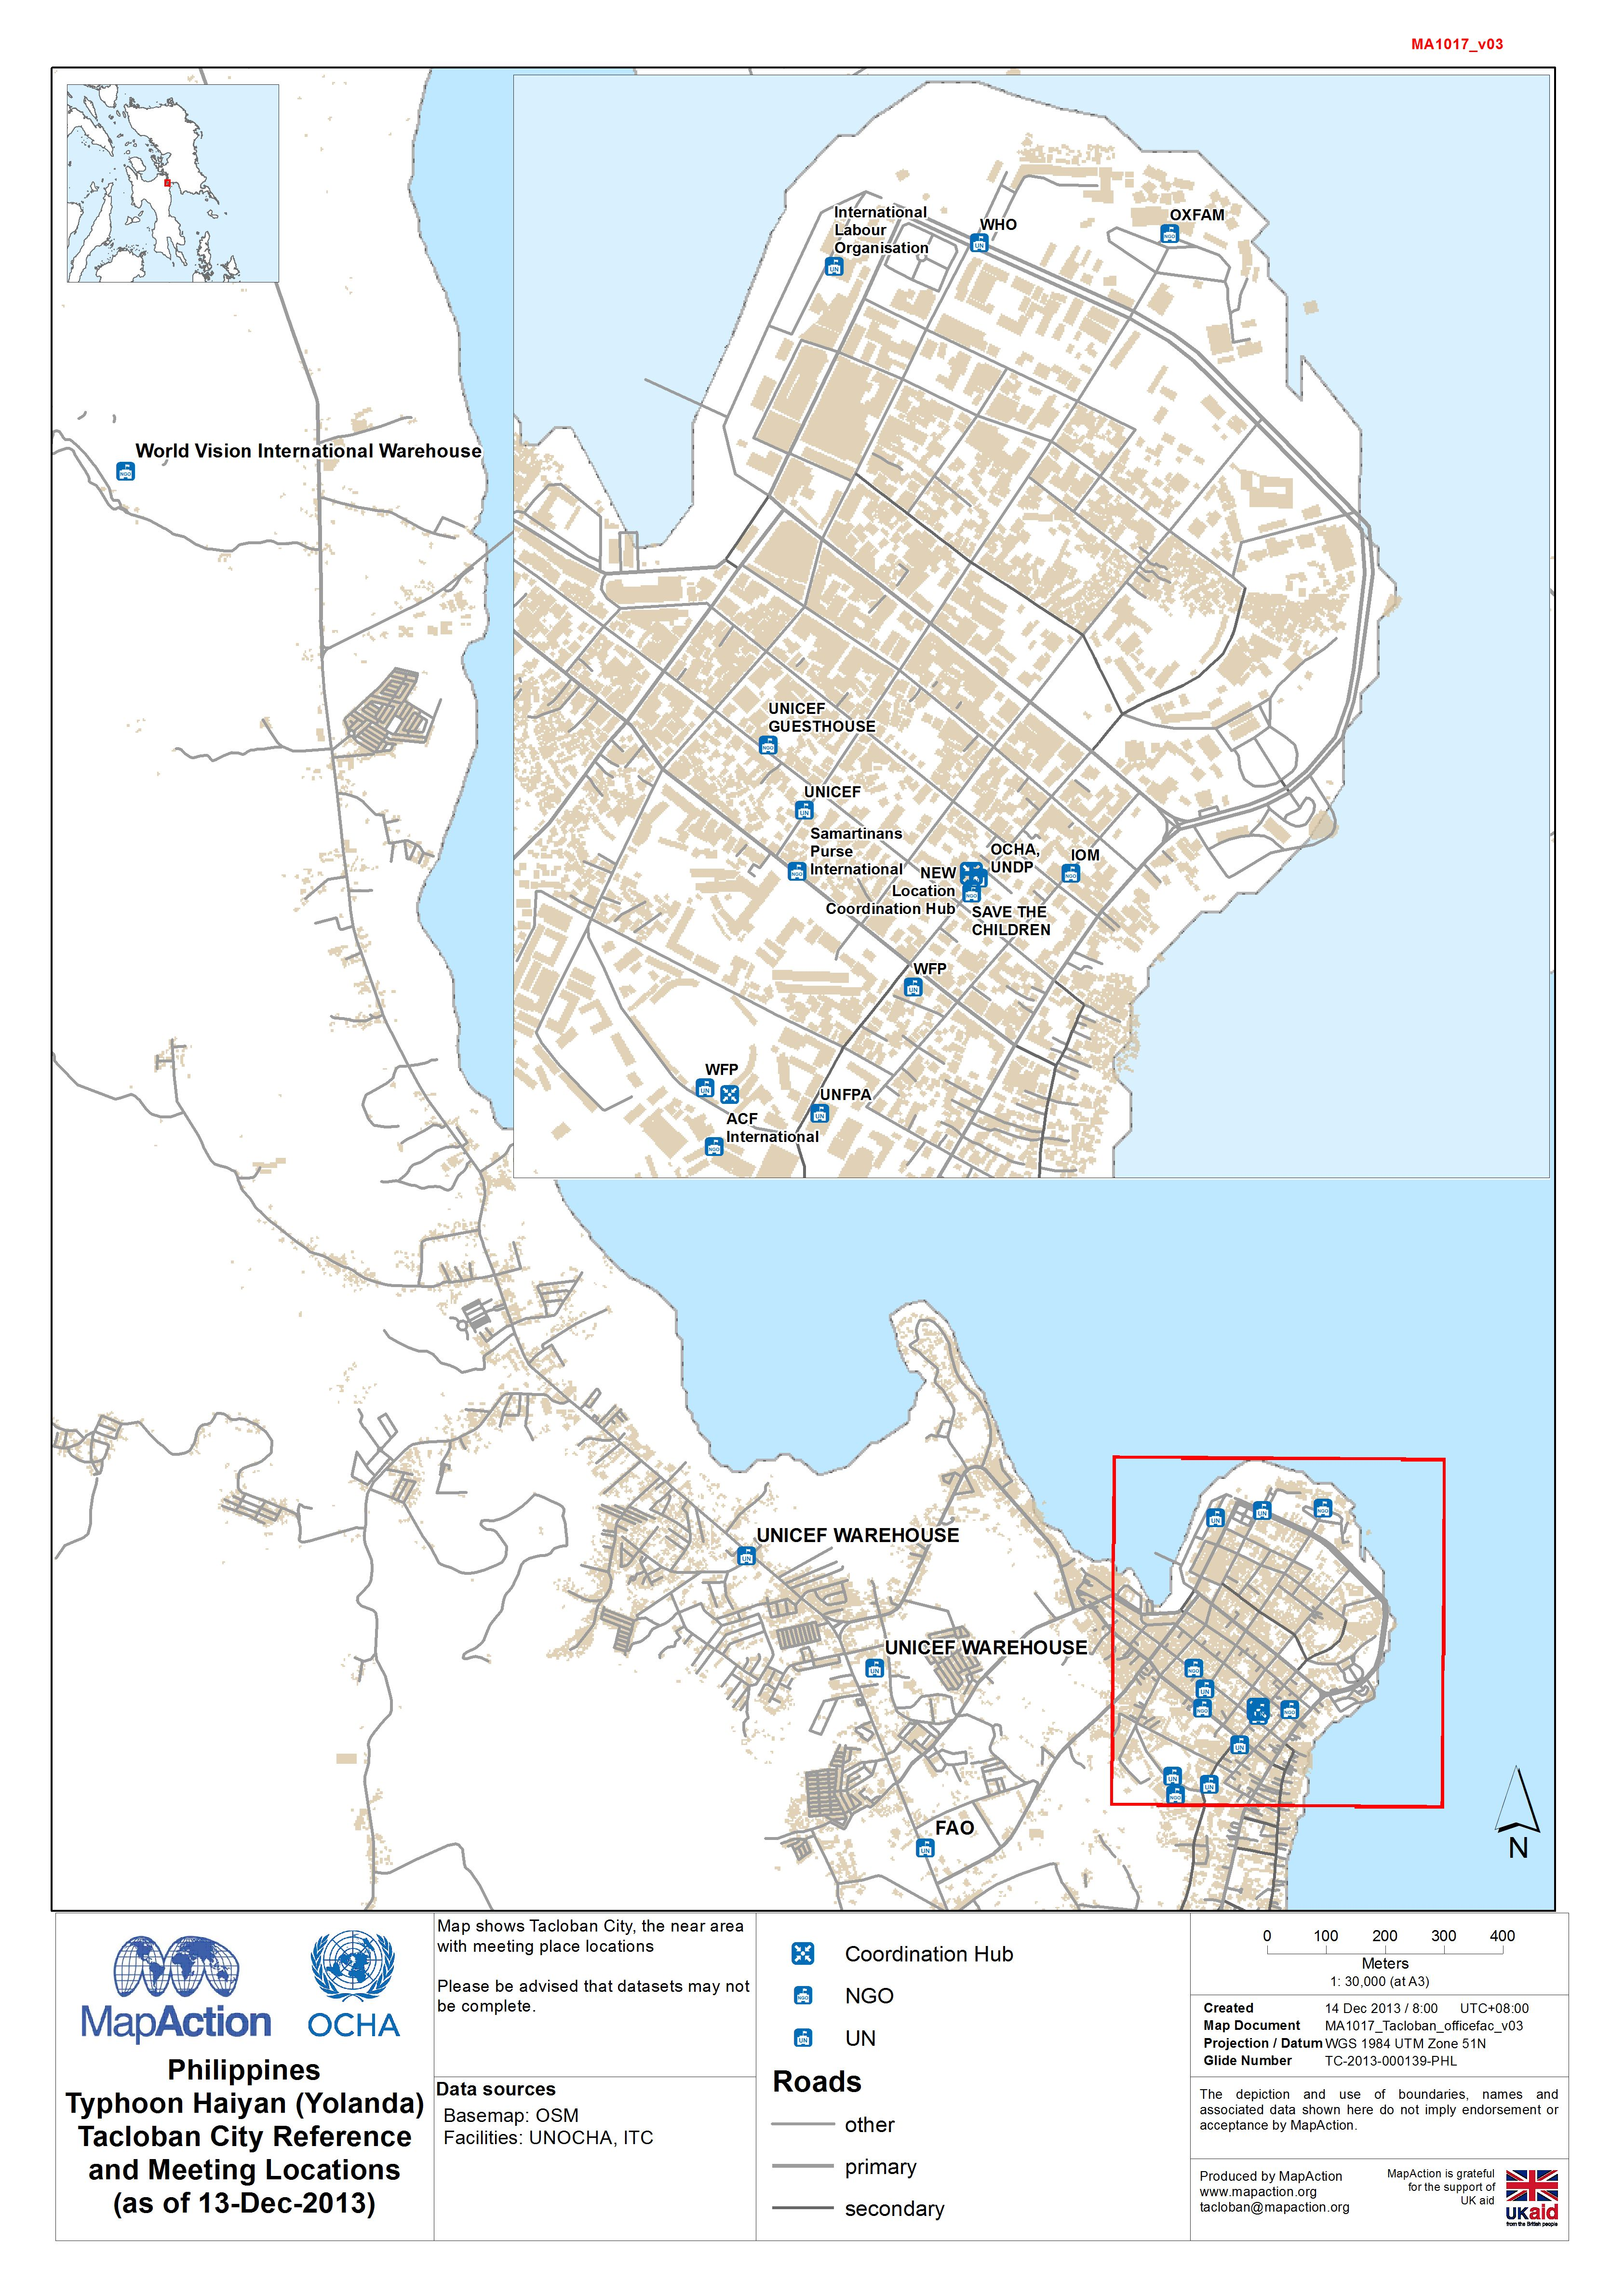 Tacloban Philippines Map.Philippines Typhoon Haiyan Yolanda Tacloban City Reference And